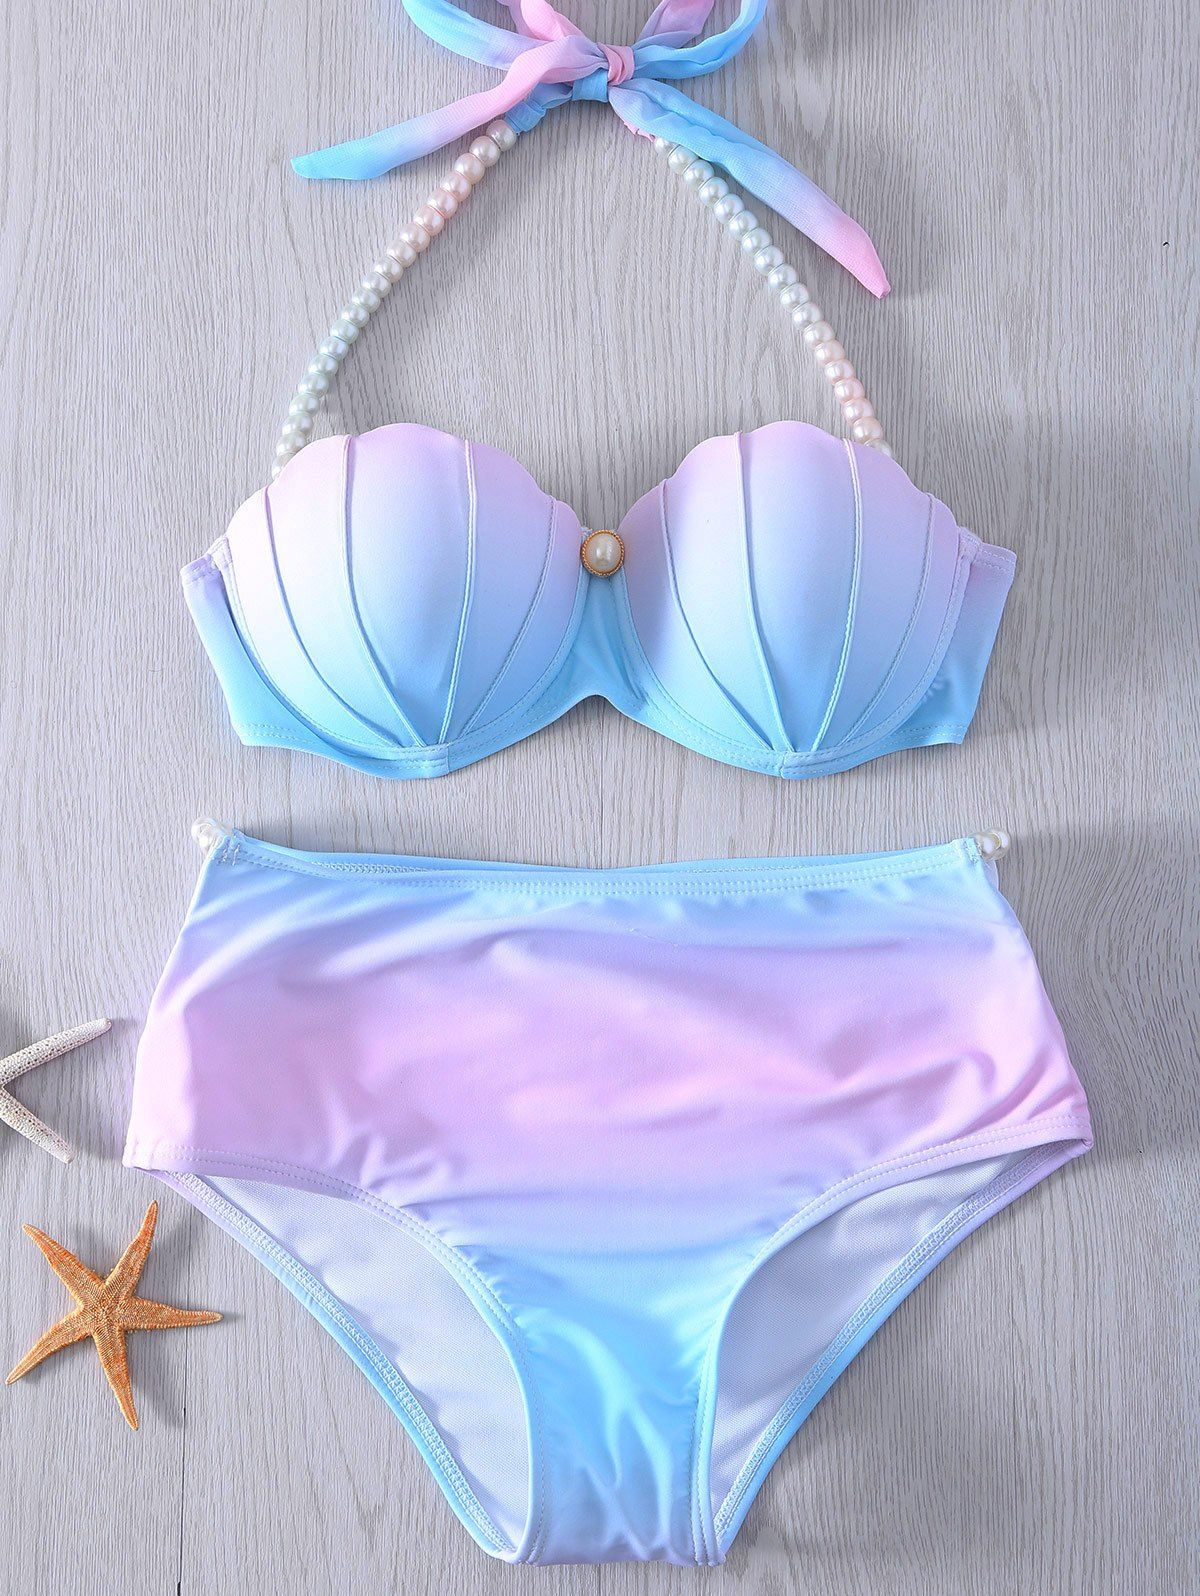 462a270c66 Stylish Halter Neck Tie Dye High Waist Pearl Embellished Bikini Set For  Women